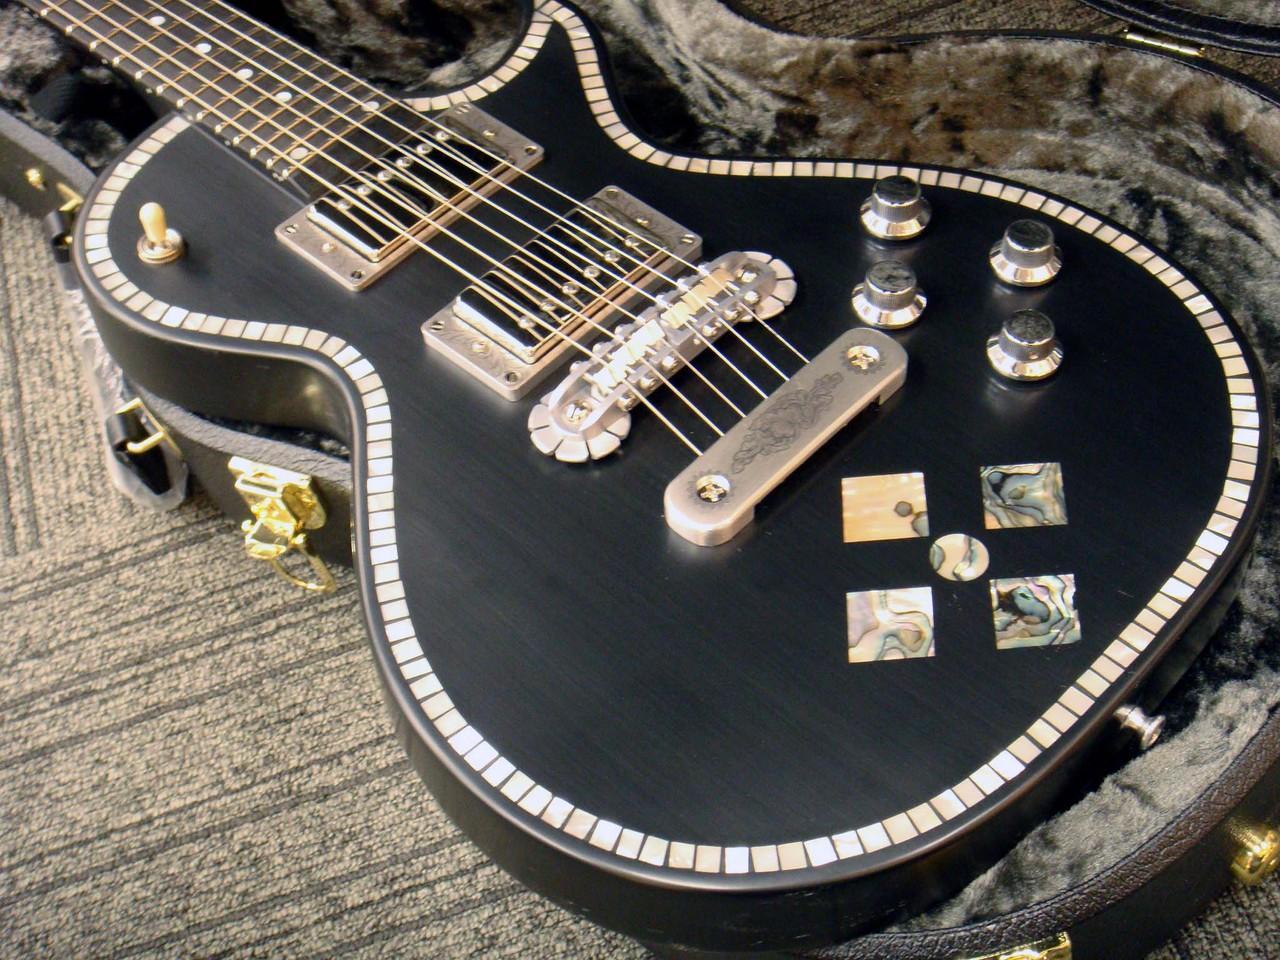 ZEMAITISCustom Shop Superior Series CS24SU BLACK PEARL DIAMOND Black (# KZ170653)【ゼマイティス】【スーペリア】【送料無料】